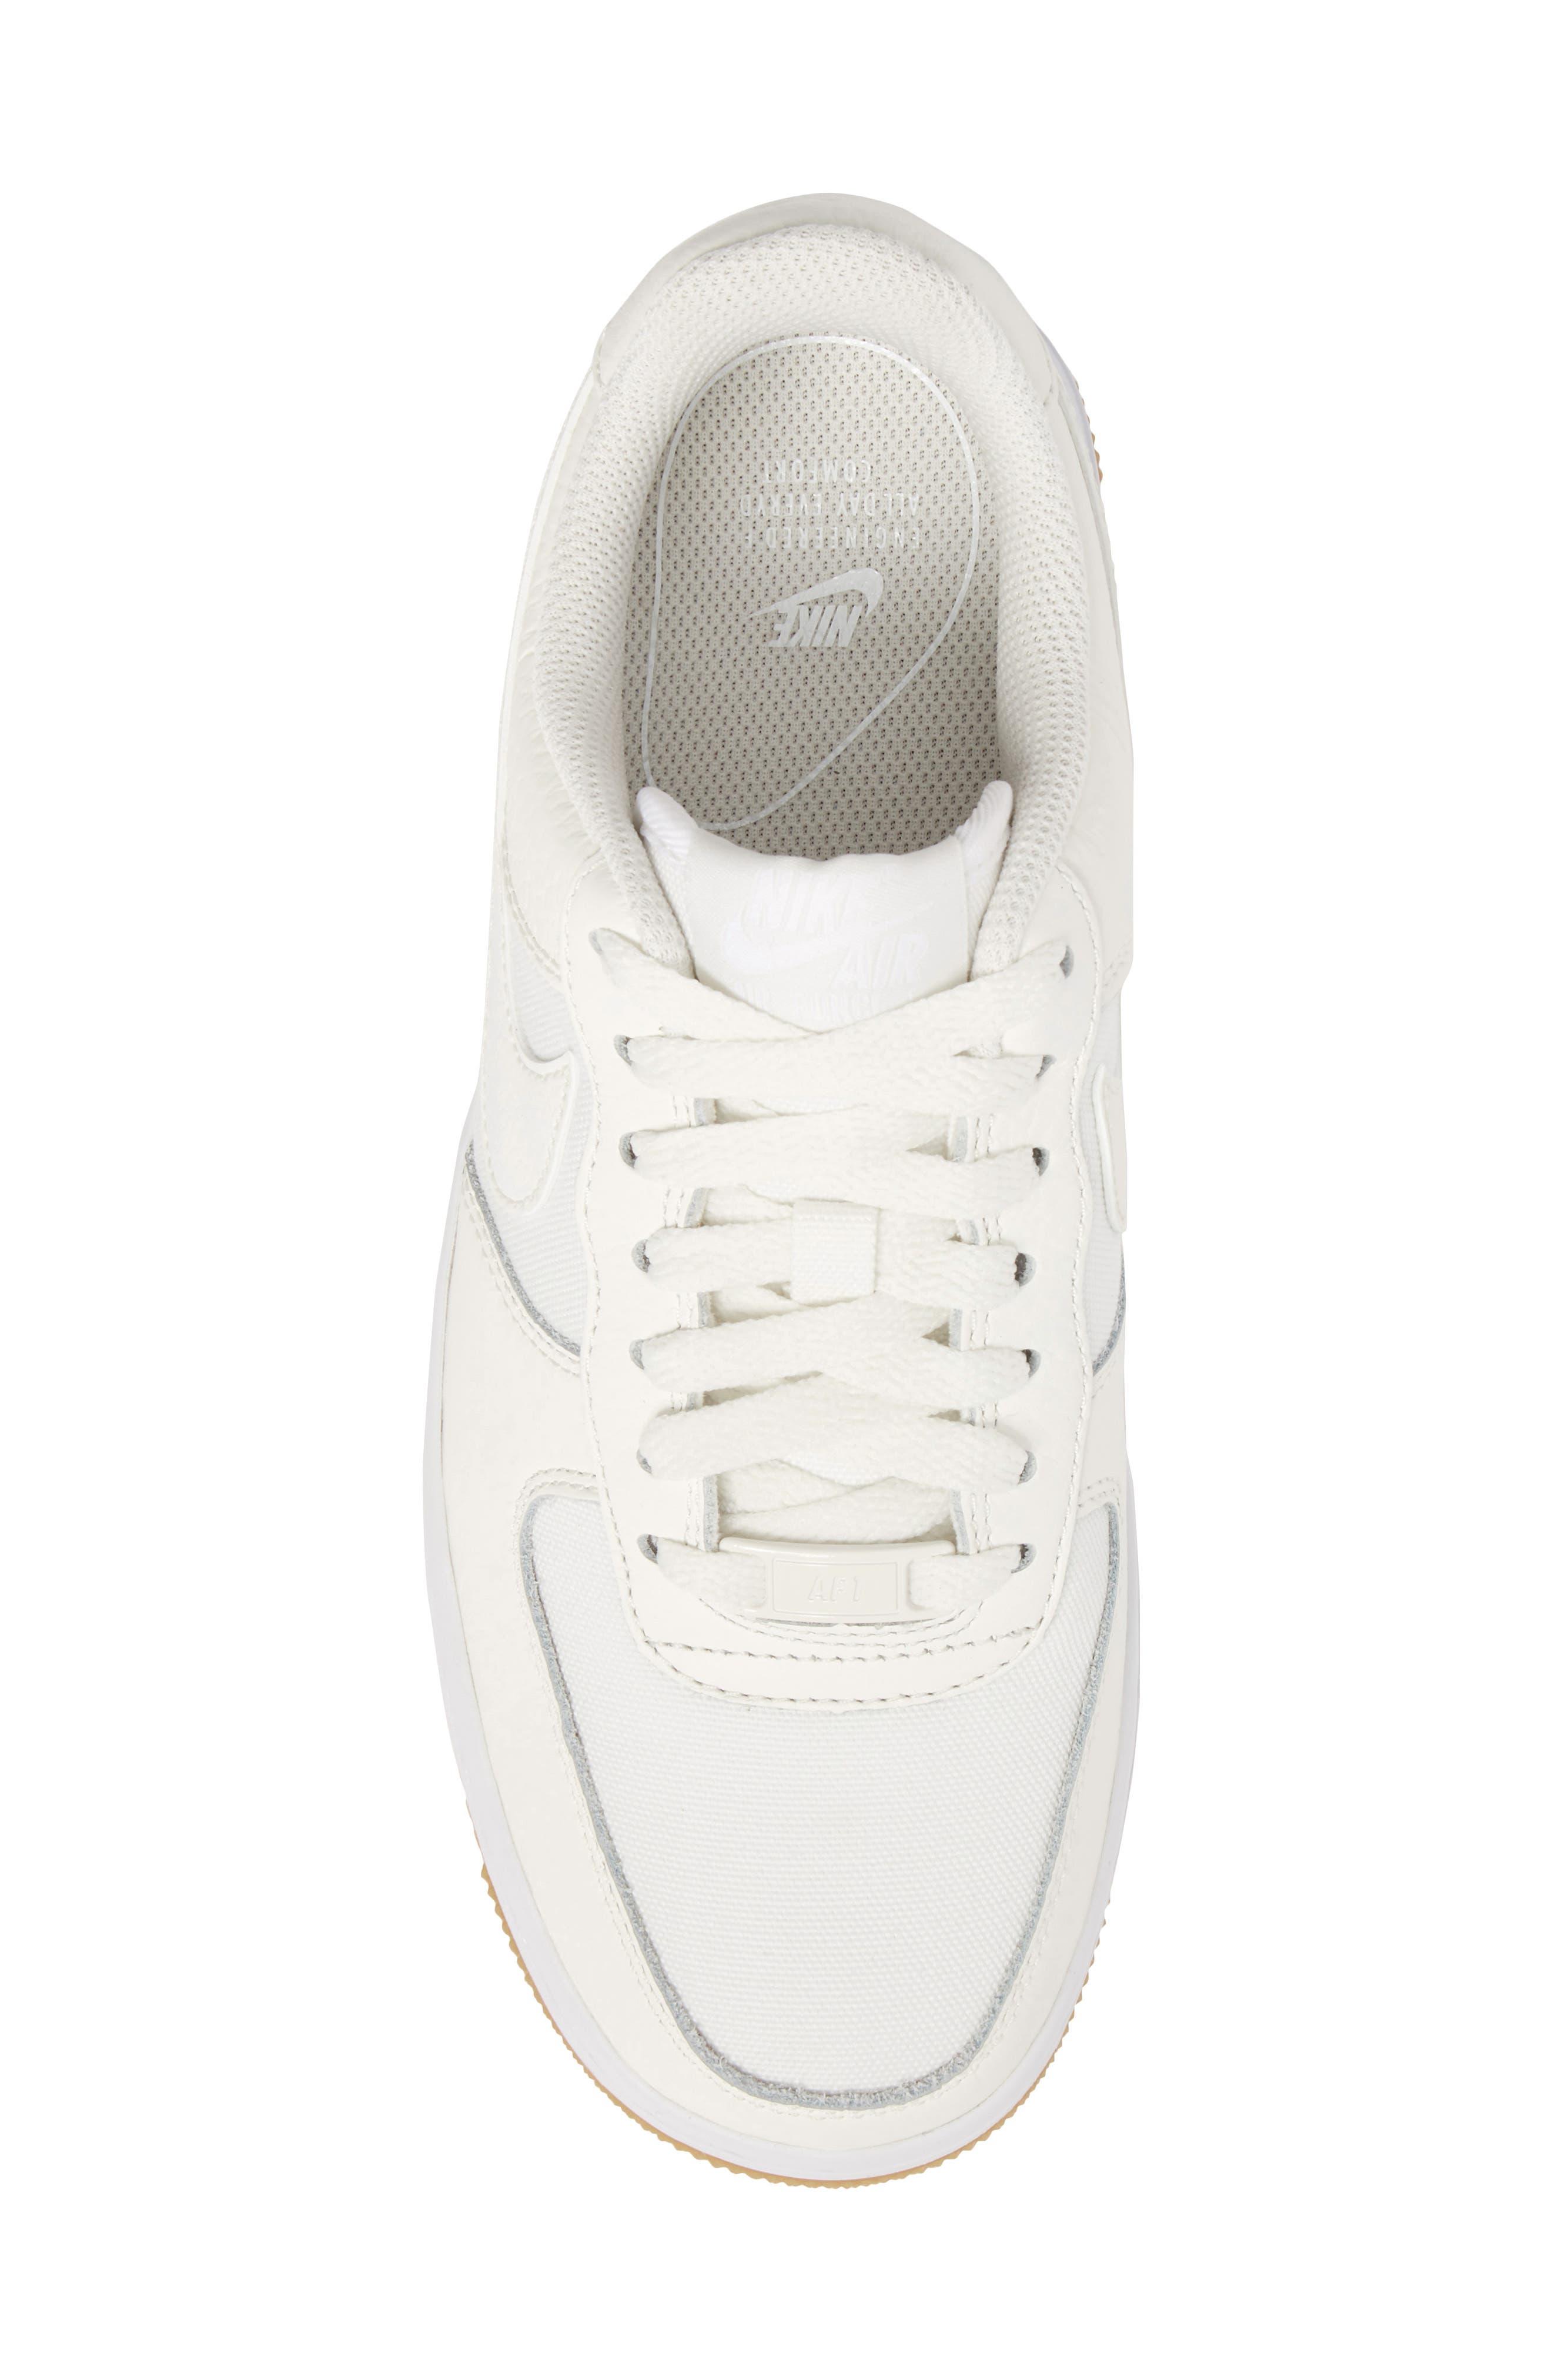 Air Force 1 '07 Premium Sneaker,                             Alternate thumbnail 5, color,                             Sail/ White/ Light Brown